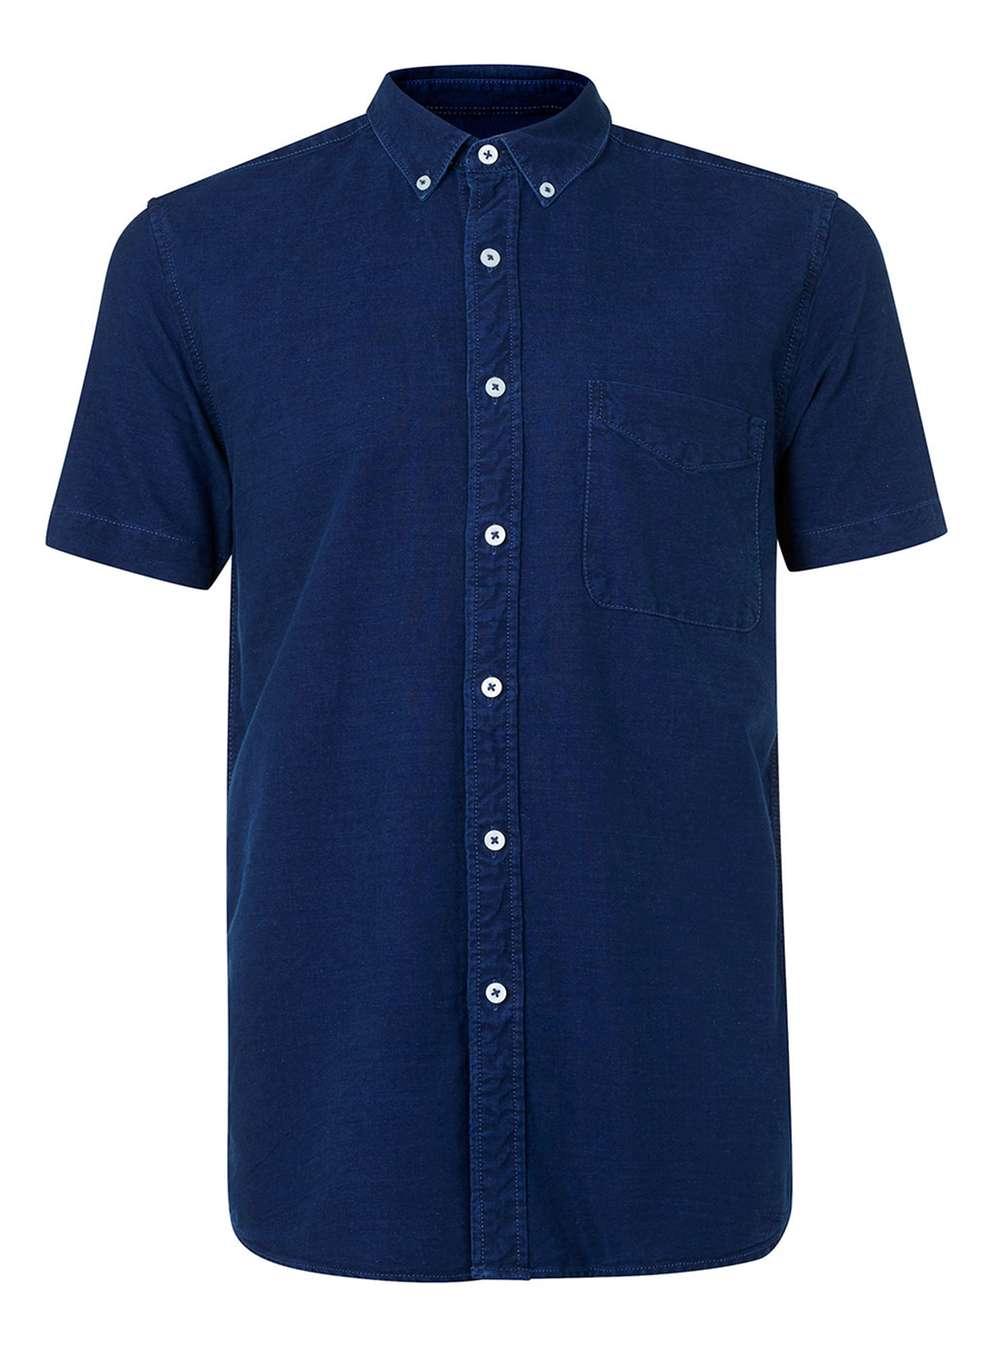 Denim short-sleeve casual shirt, £20 ( topman.com )